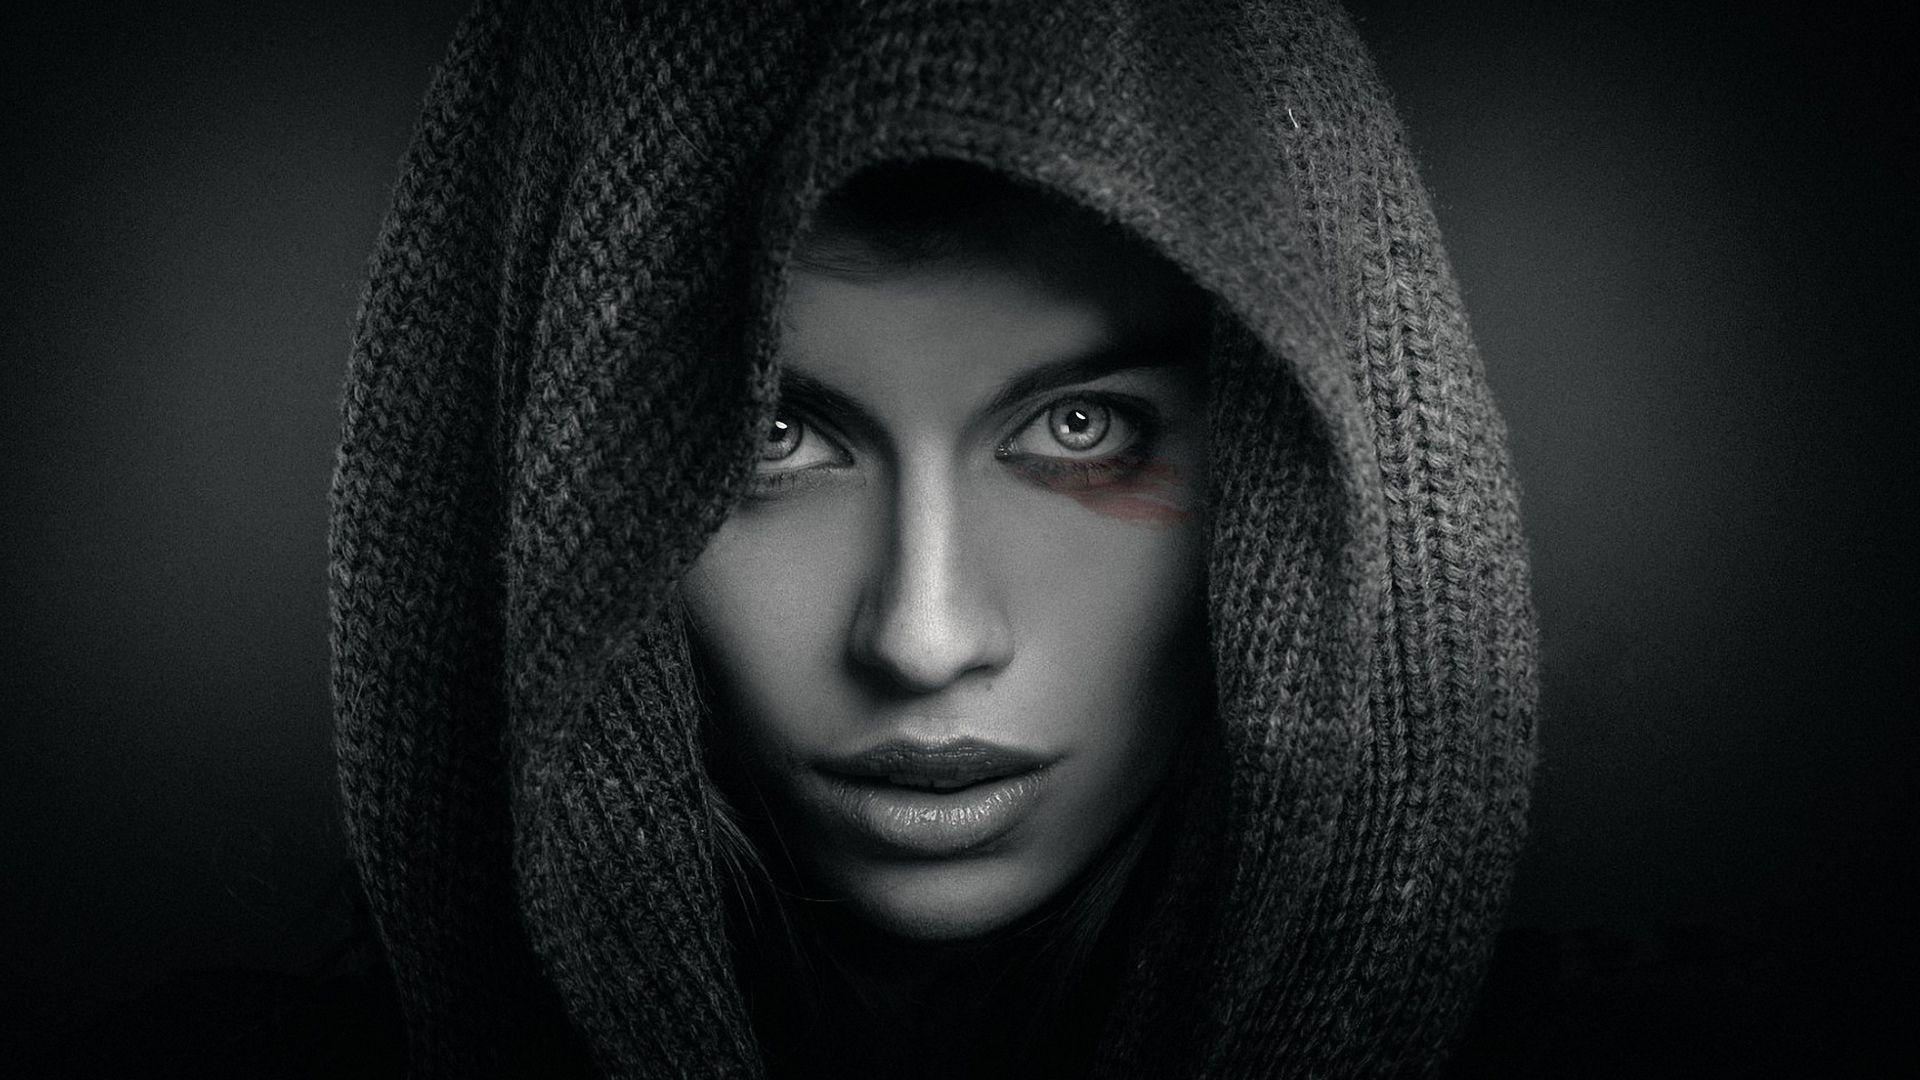 Hood background image